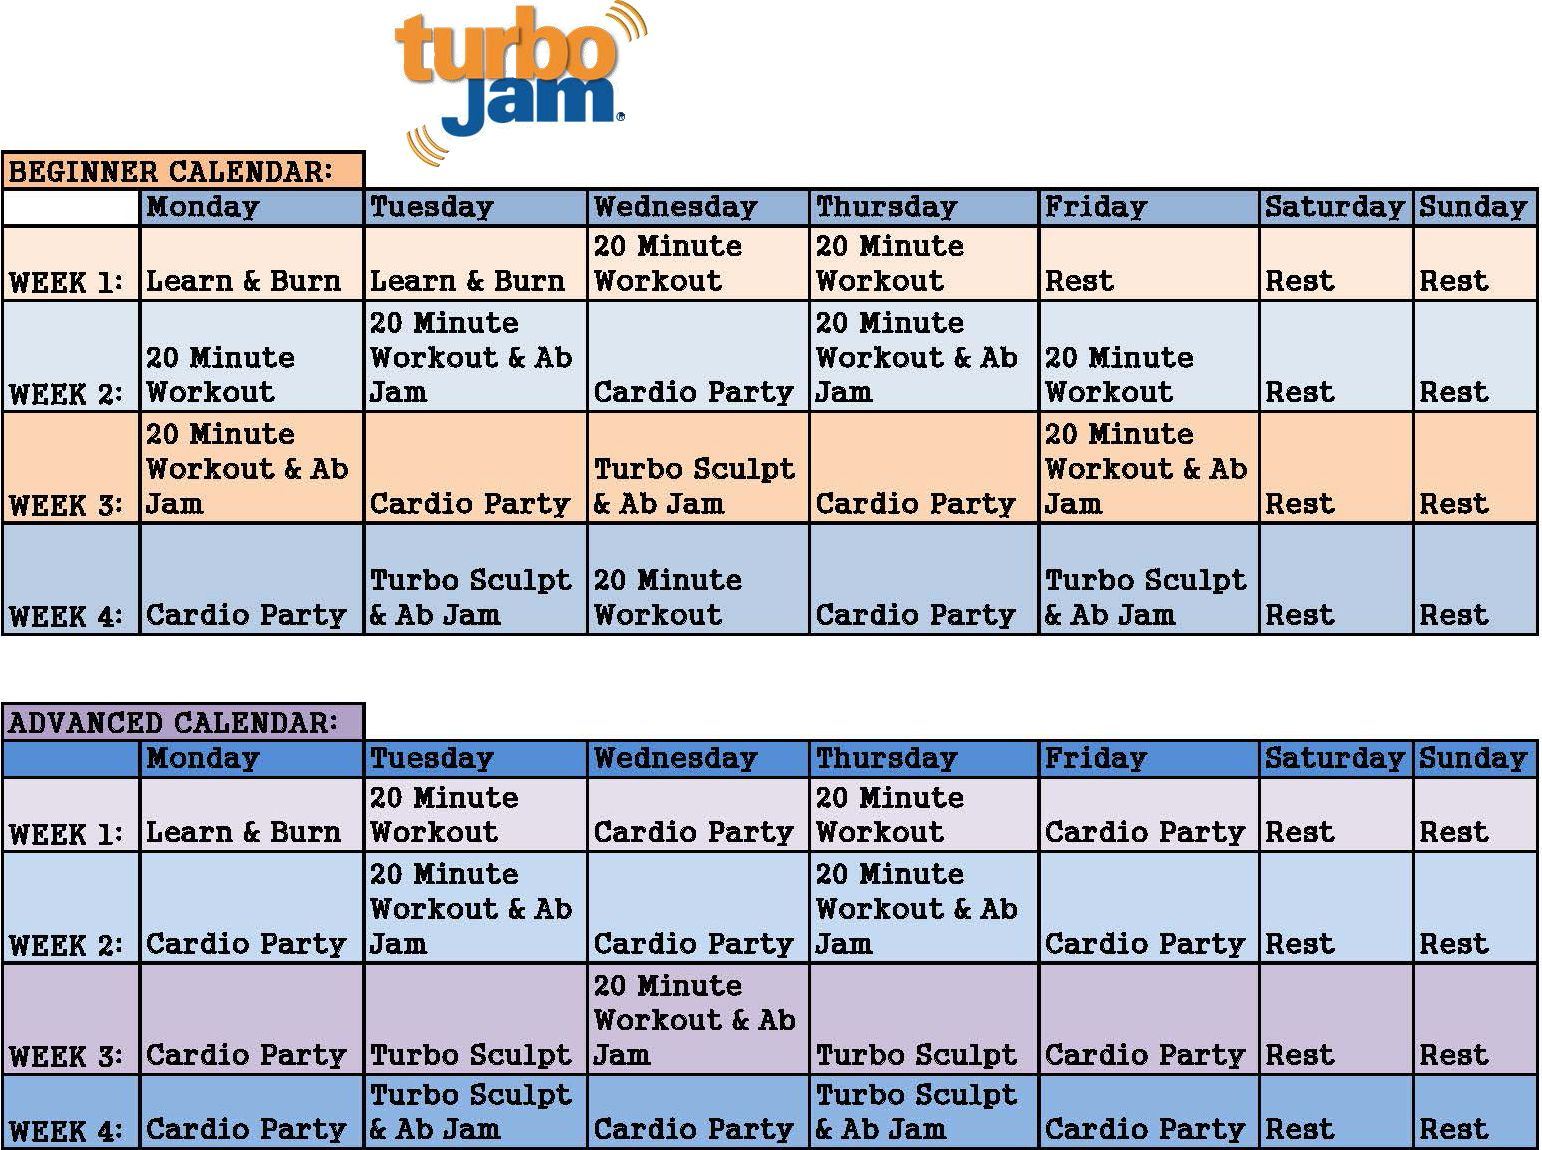 Chalene Johnson Turbo Jam Calendar From Beachbody Turbo